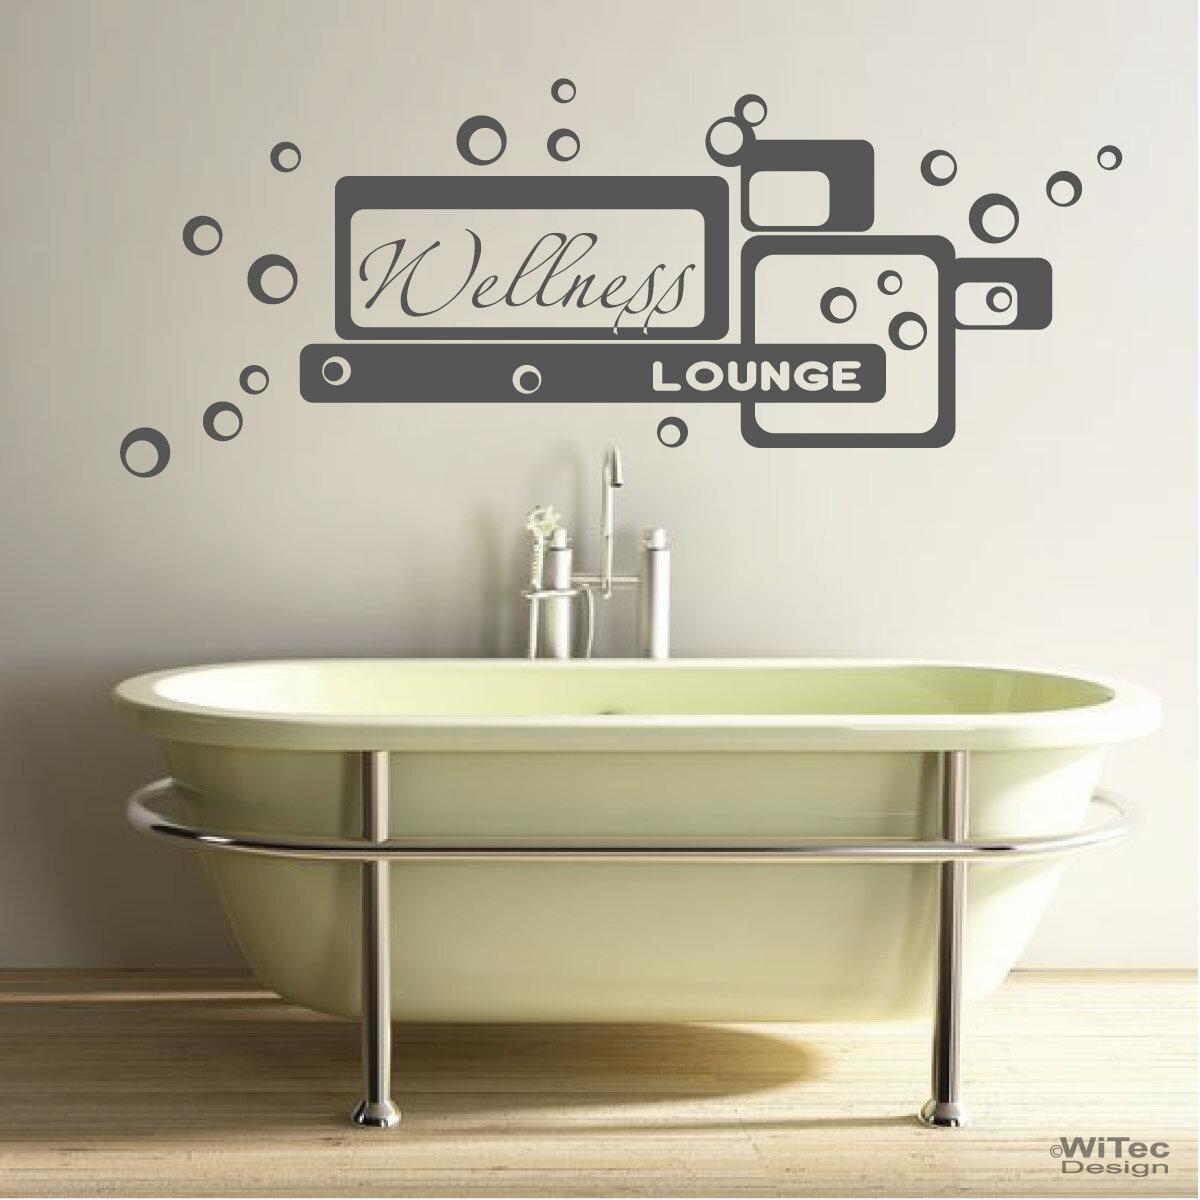 Wandtattoo wellness lounge wandaufkleber bad badezimmer - Badezimmer aufkleber ...